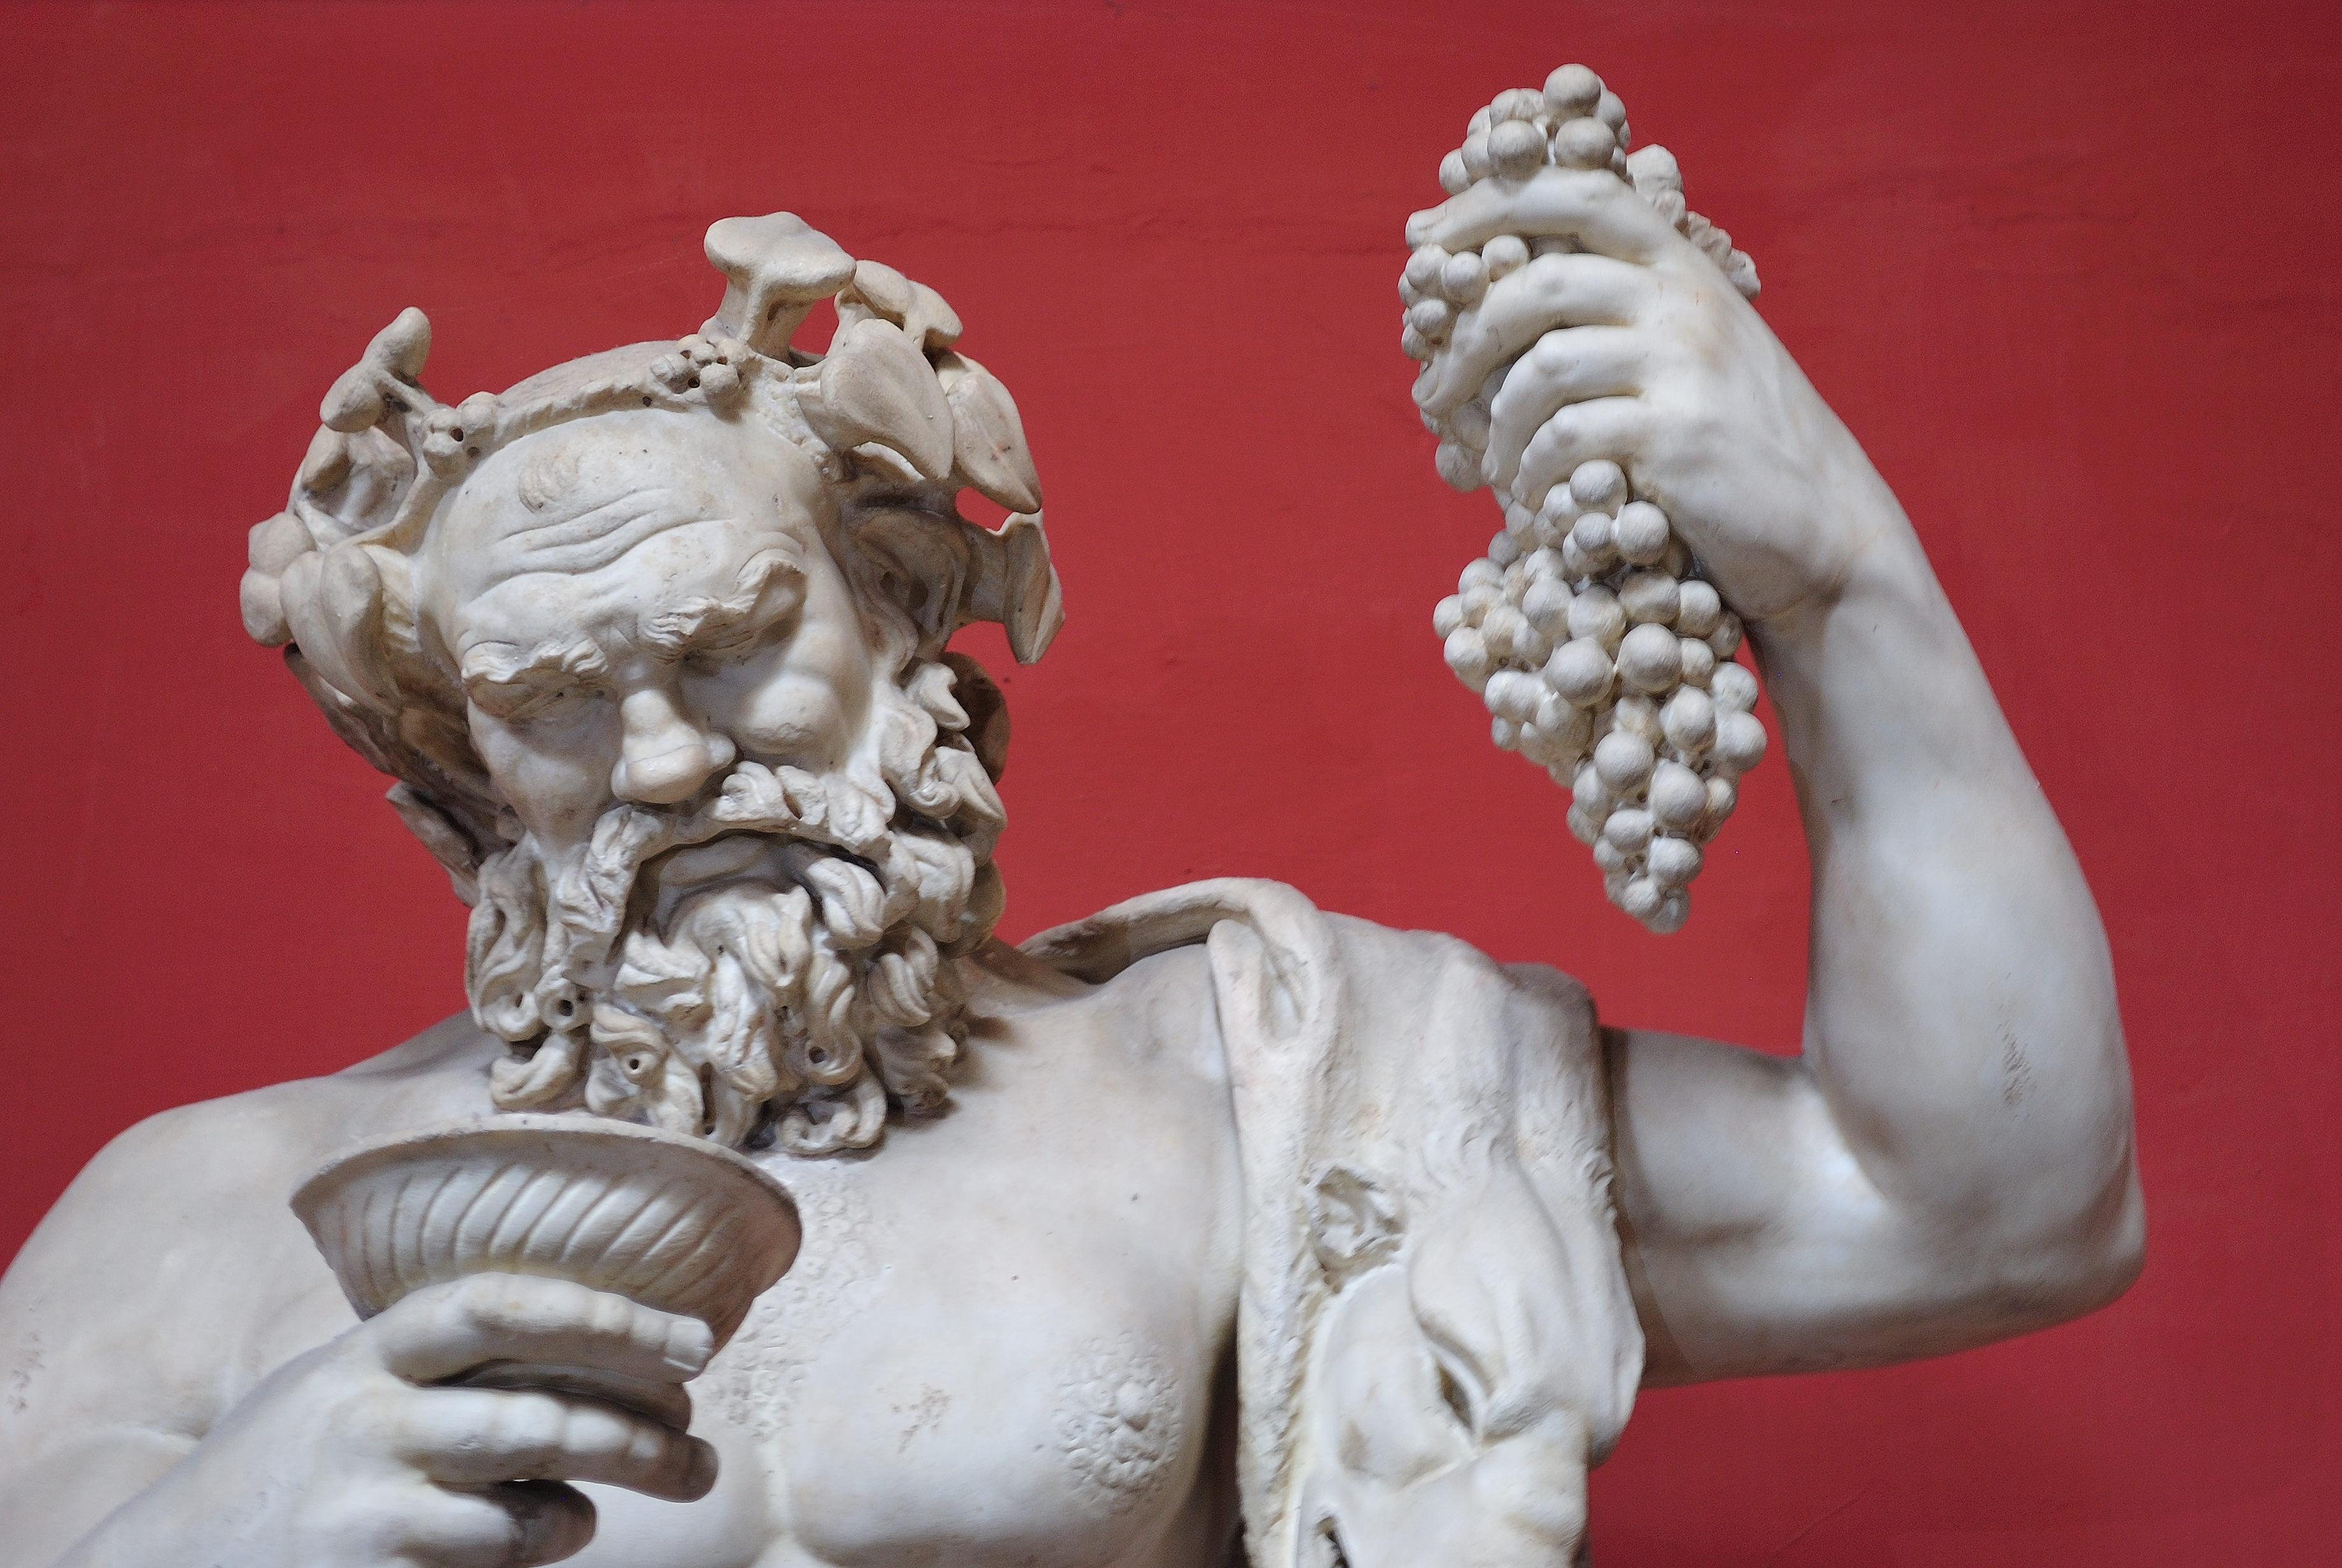 Birth of Dionysus - Greek Mythological God of Wine